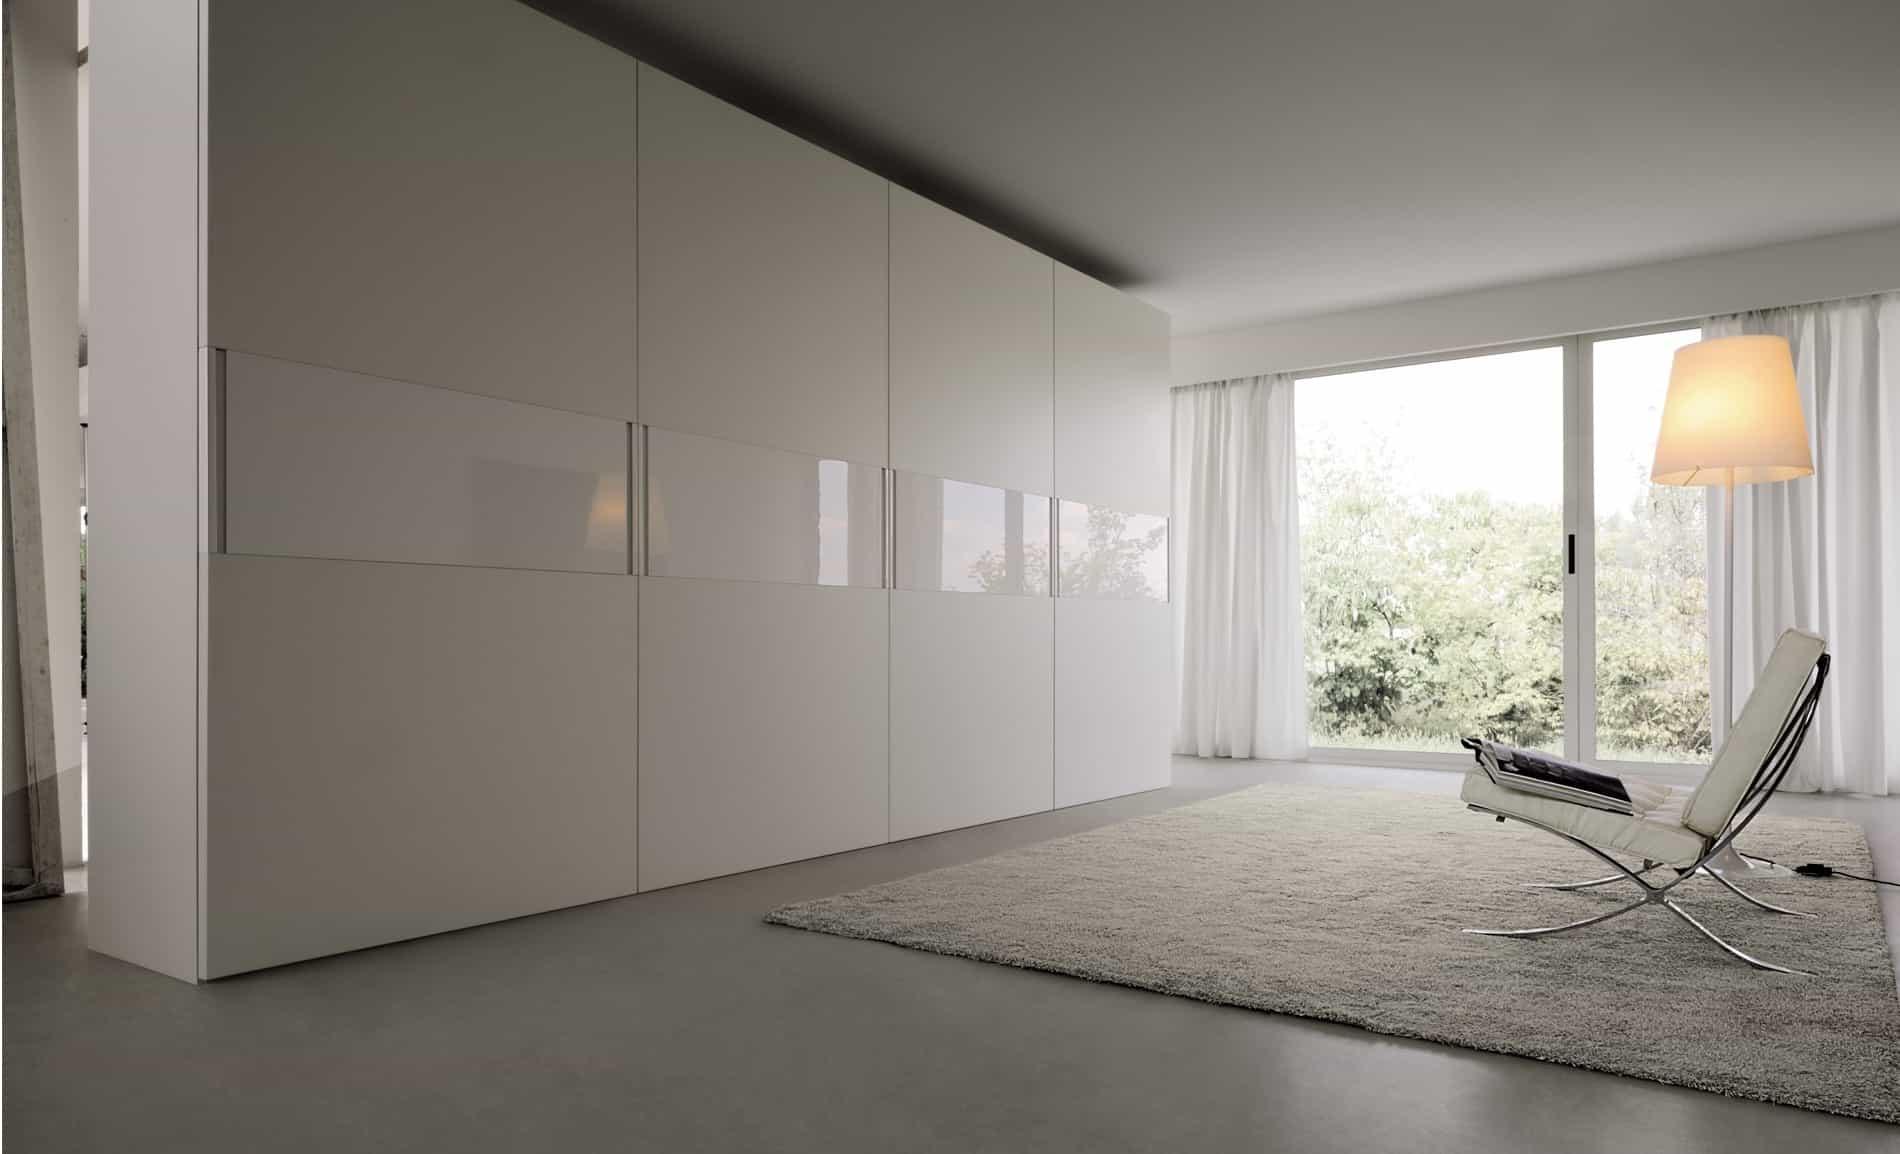 san giacomo schrank hill schiebet ren. Black Bedroom Furniture Sets. Home Design Ideas